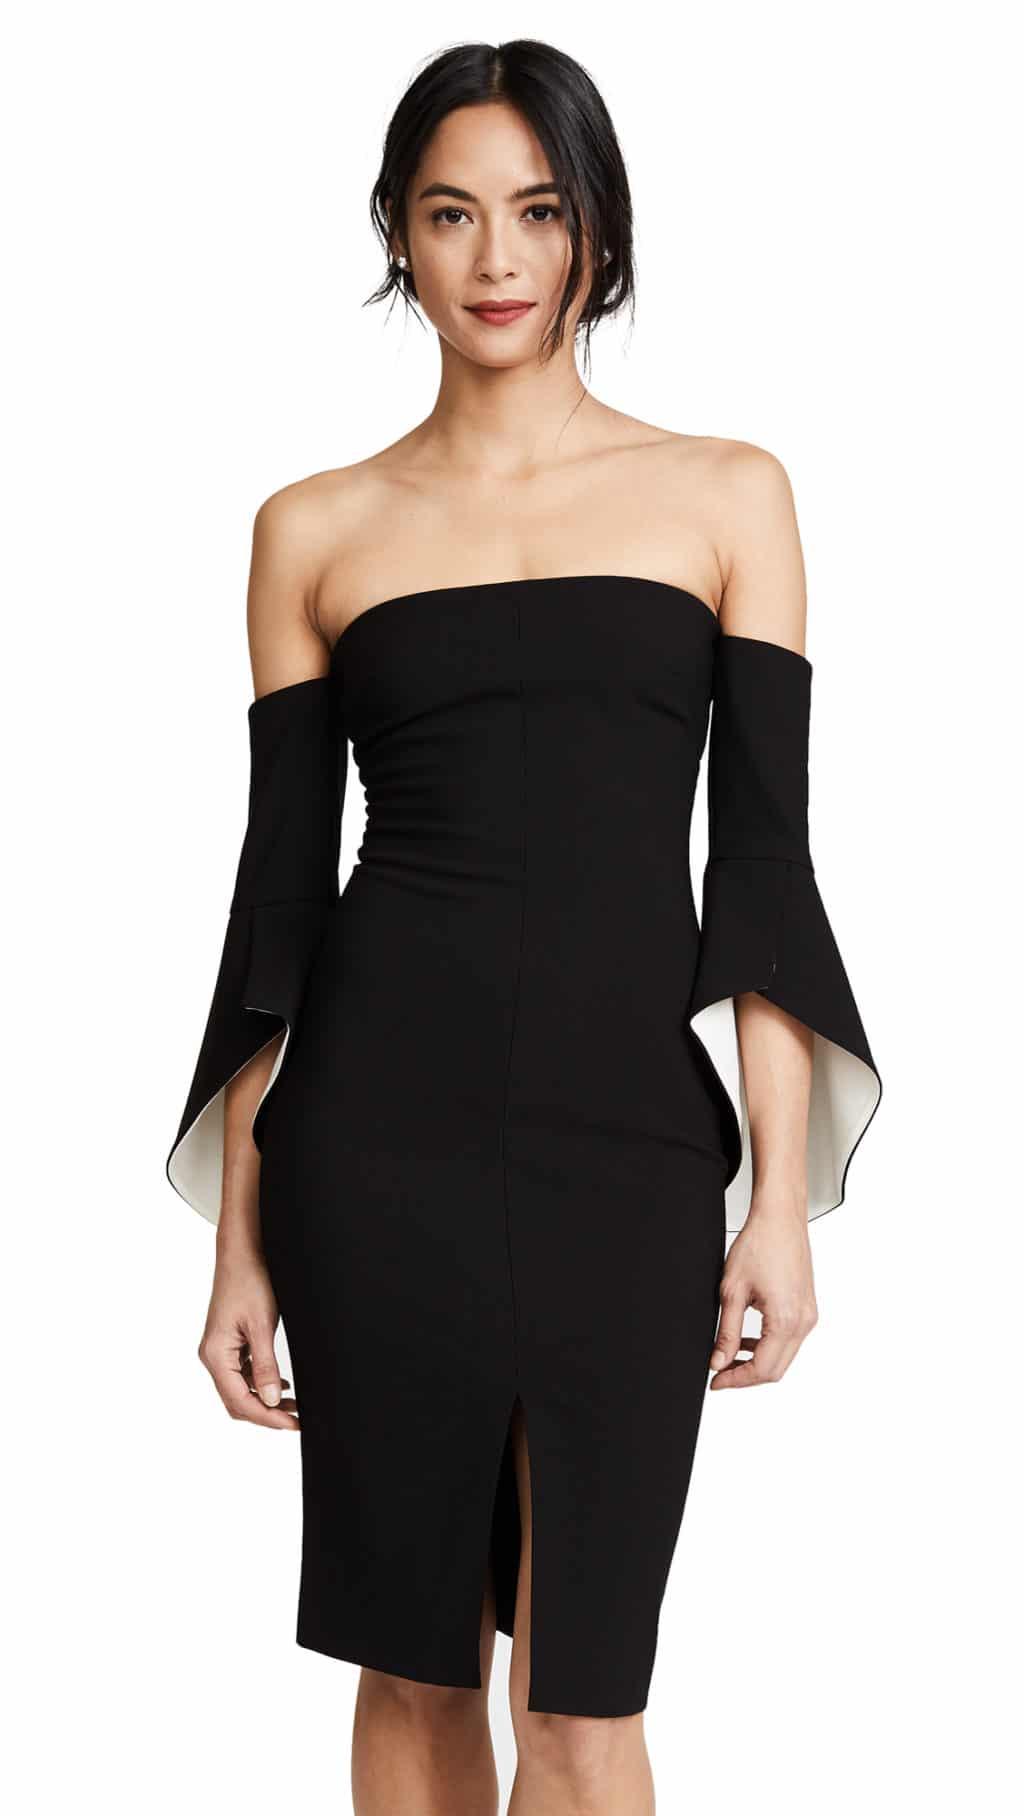 LIKELY Ramona Black / White Dress